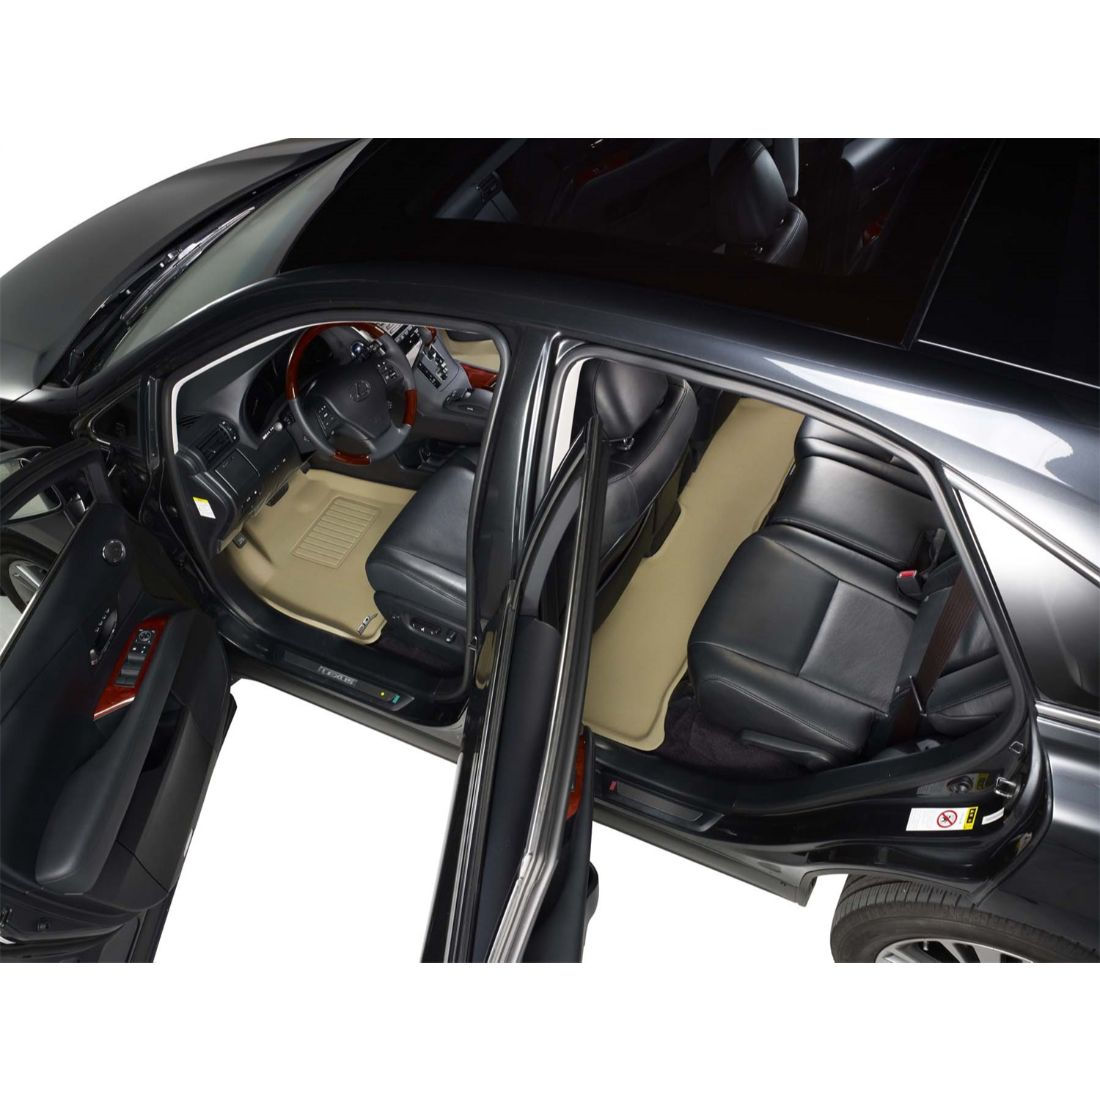 thumbnail 21 - 3D MAXpider Custom Fit KAGU All-Weather Floor Mats for Scion 2013-2015 xB